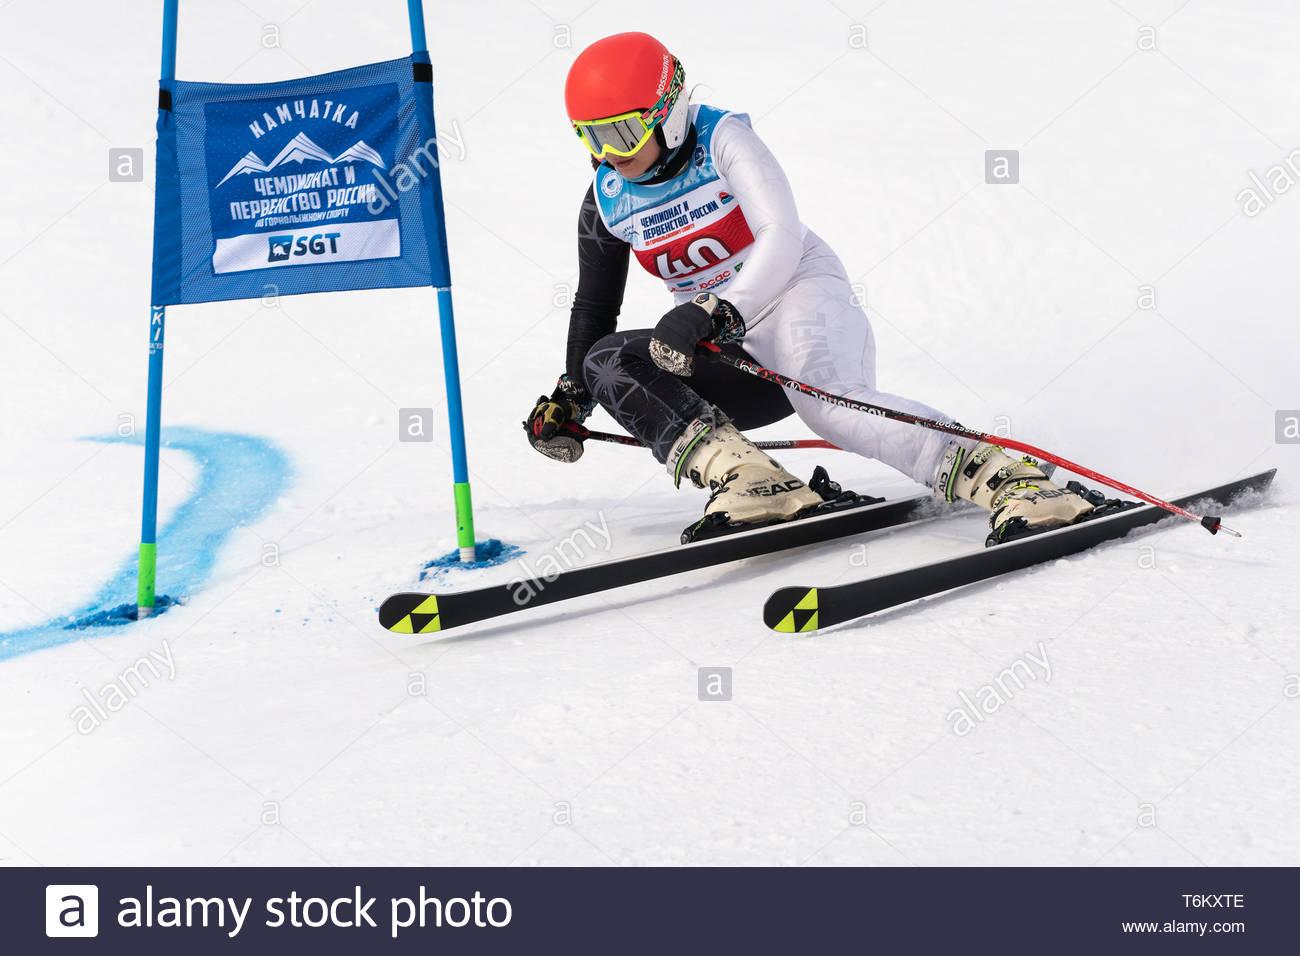 KAMCHATKA, RUSSIA - APRIL 2, 2019: International Ski Federation Championship, Russian Women's Alpine Skiing Cup, giant slalom. Mountain skier Kudryavt - Stock Image